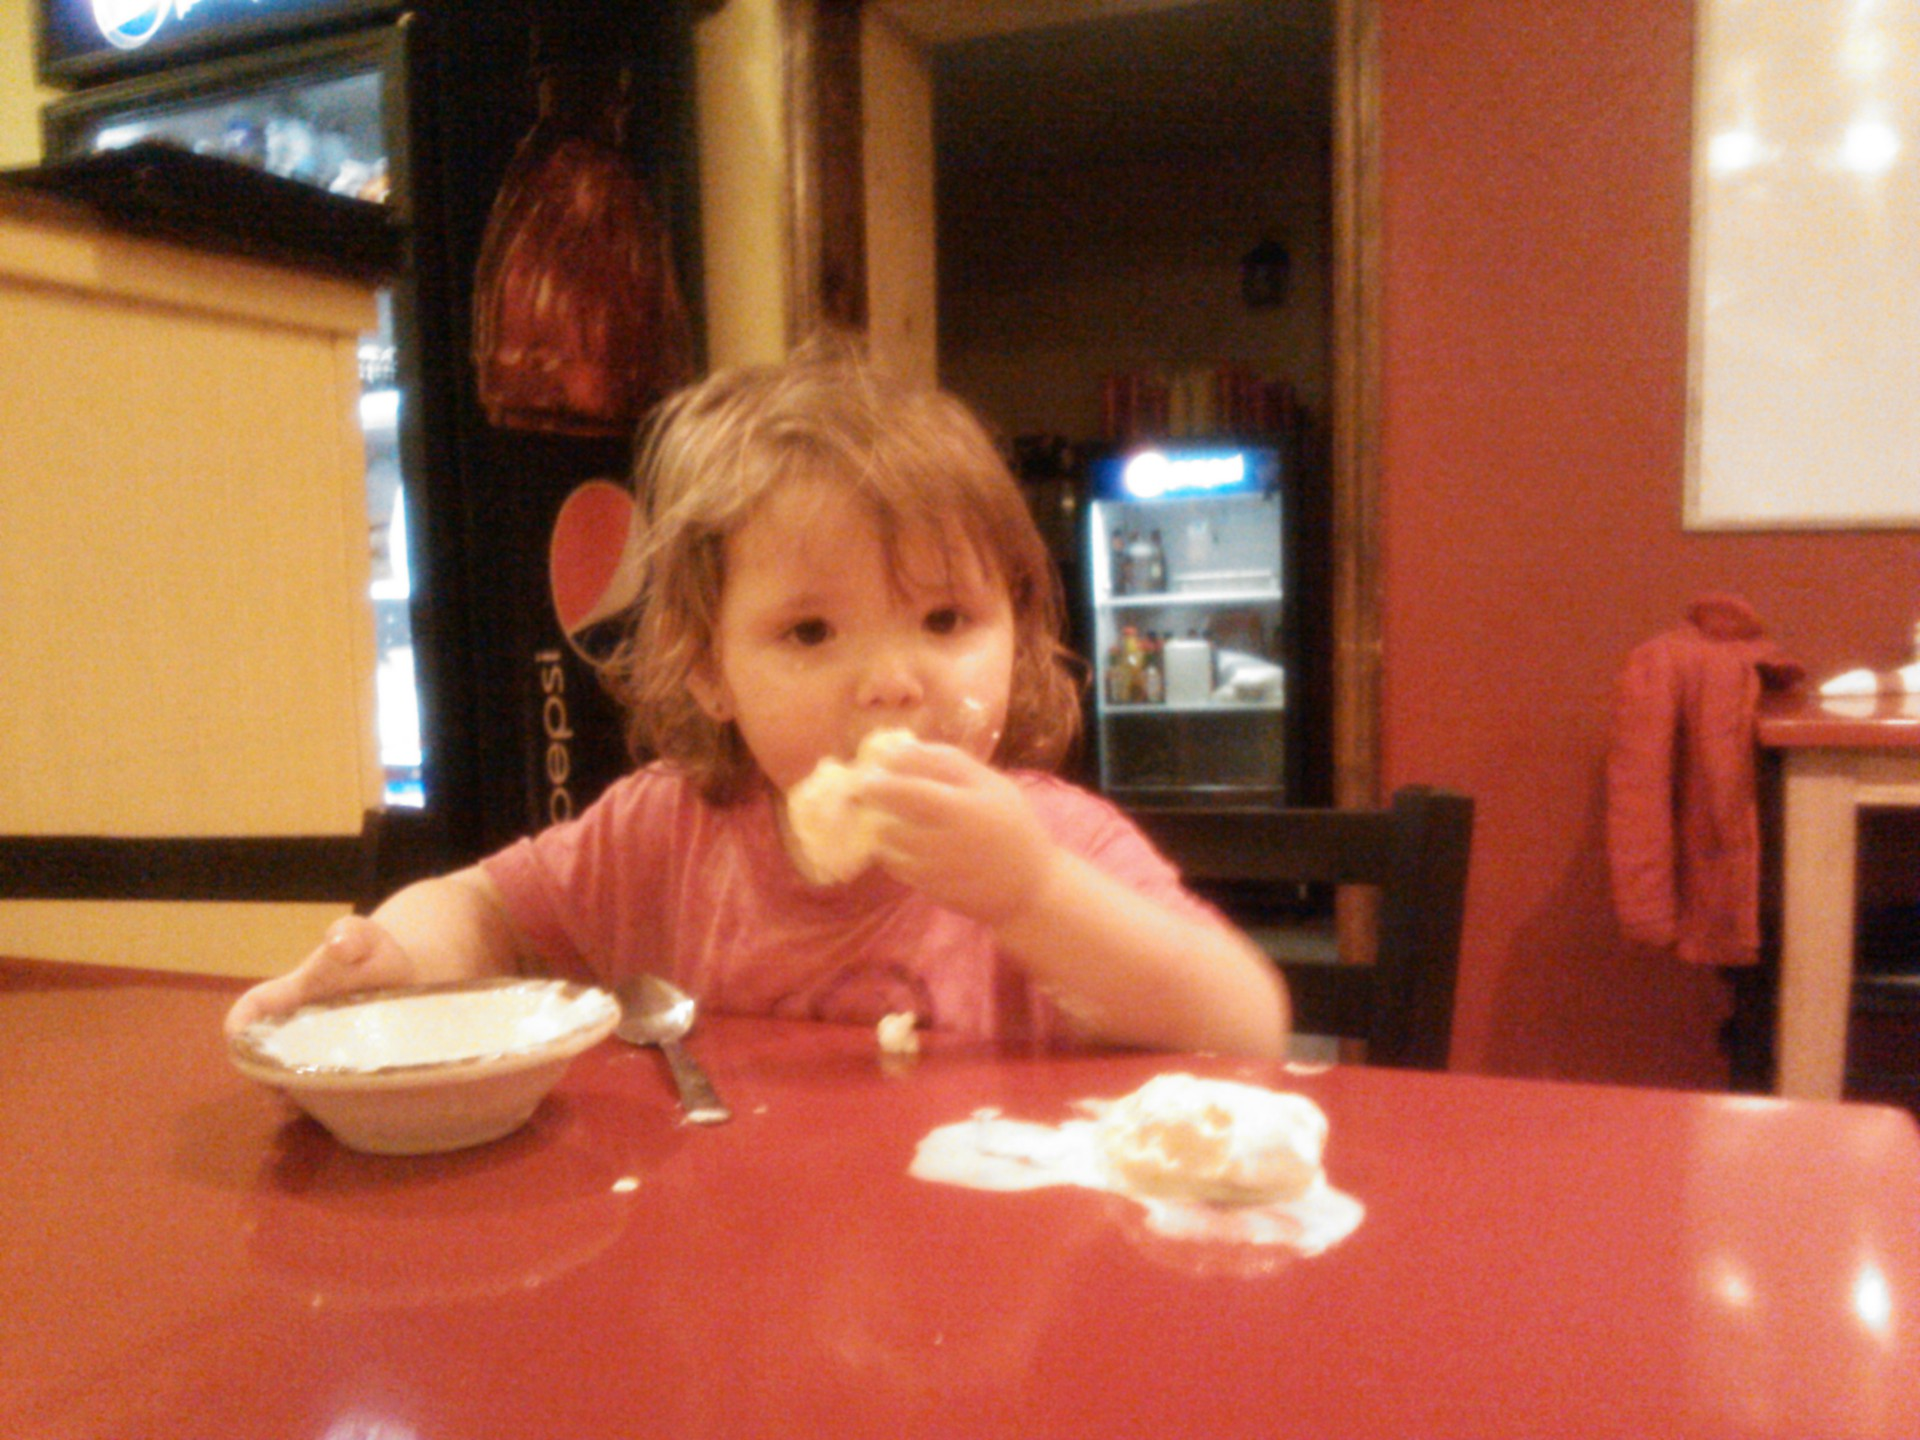 Eating pie